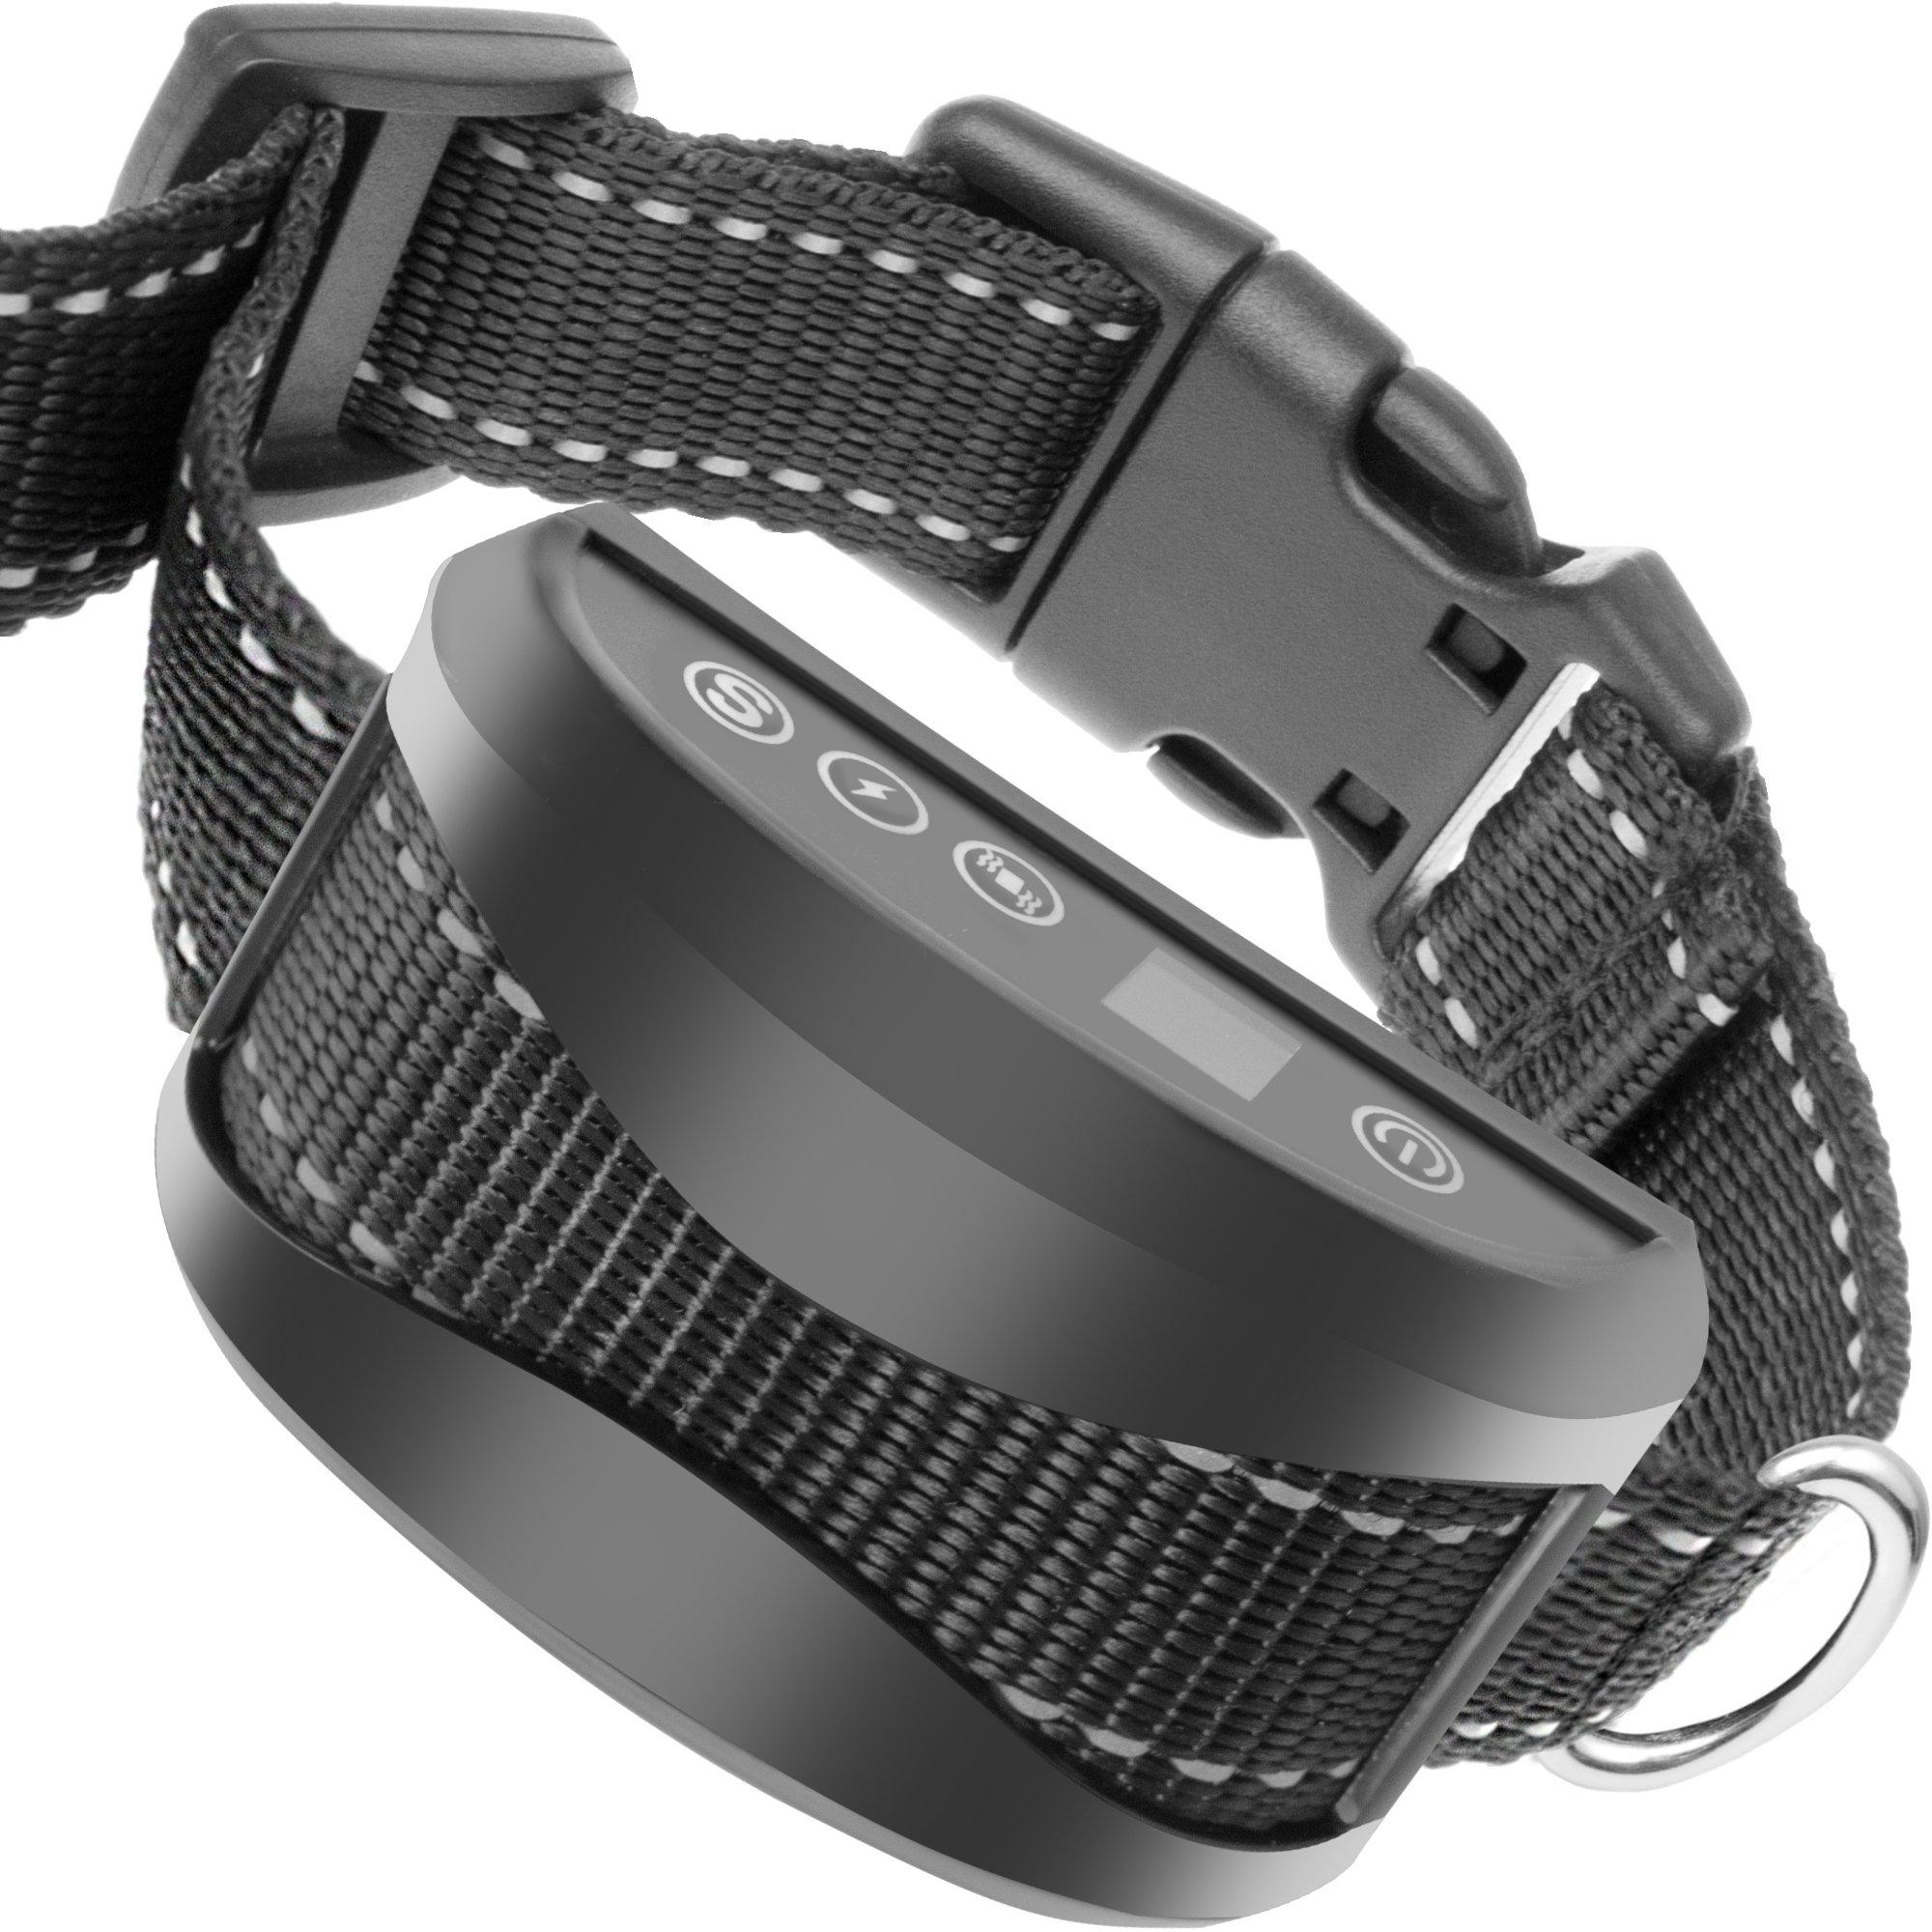 TIFTAF Bark Collar [1 Year Warranty, 2018 Upgrade] Harmless & Humane Anti Barking Control Device Train Your Pet. Safe for Large Medium & Small Dog Rechargeable Rainproof Lightweight